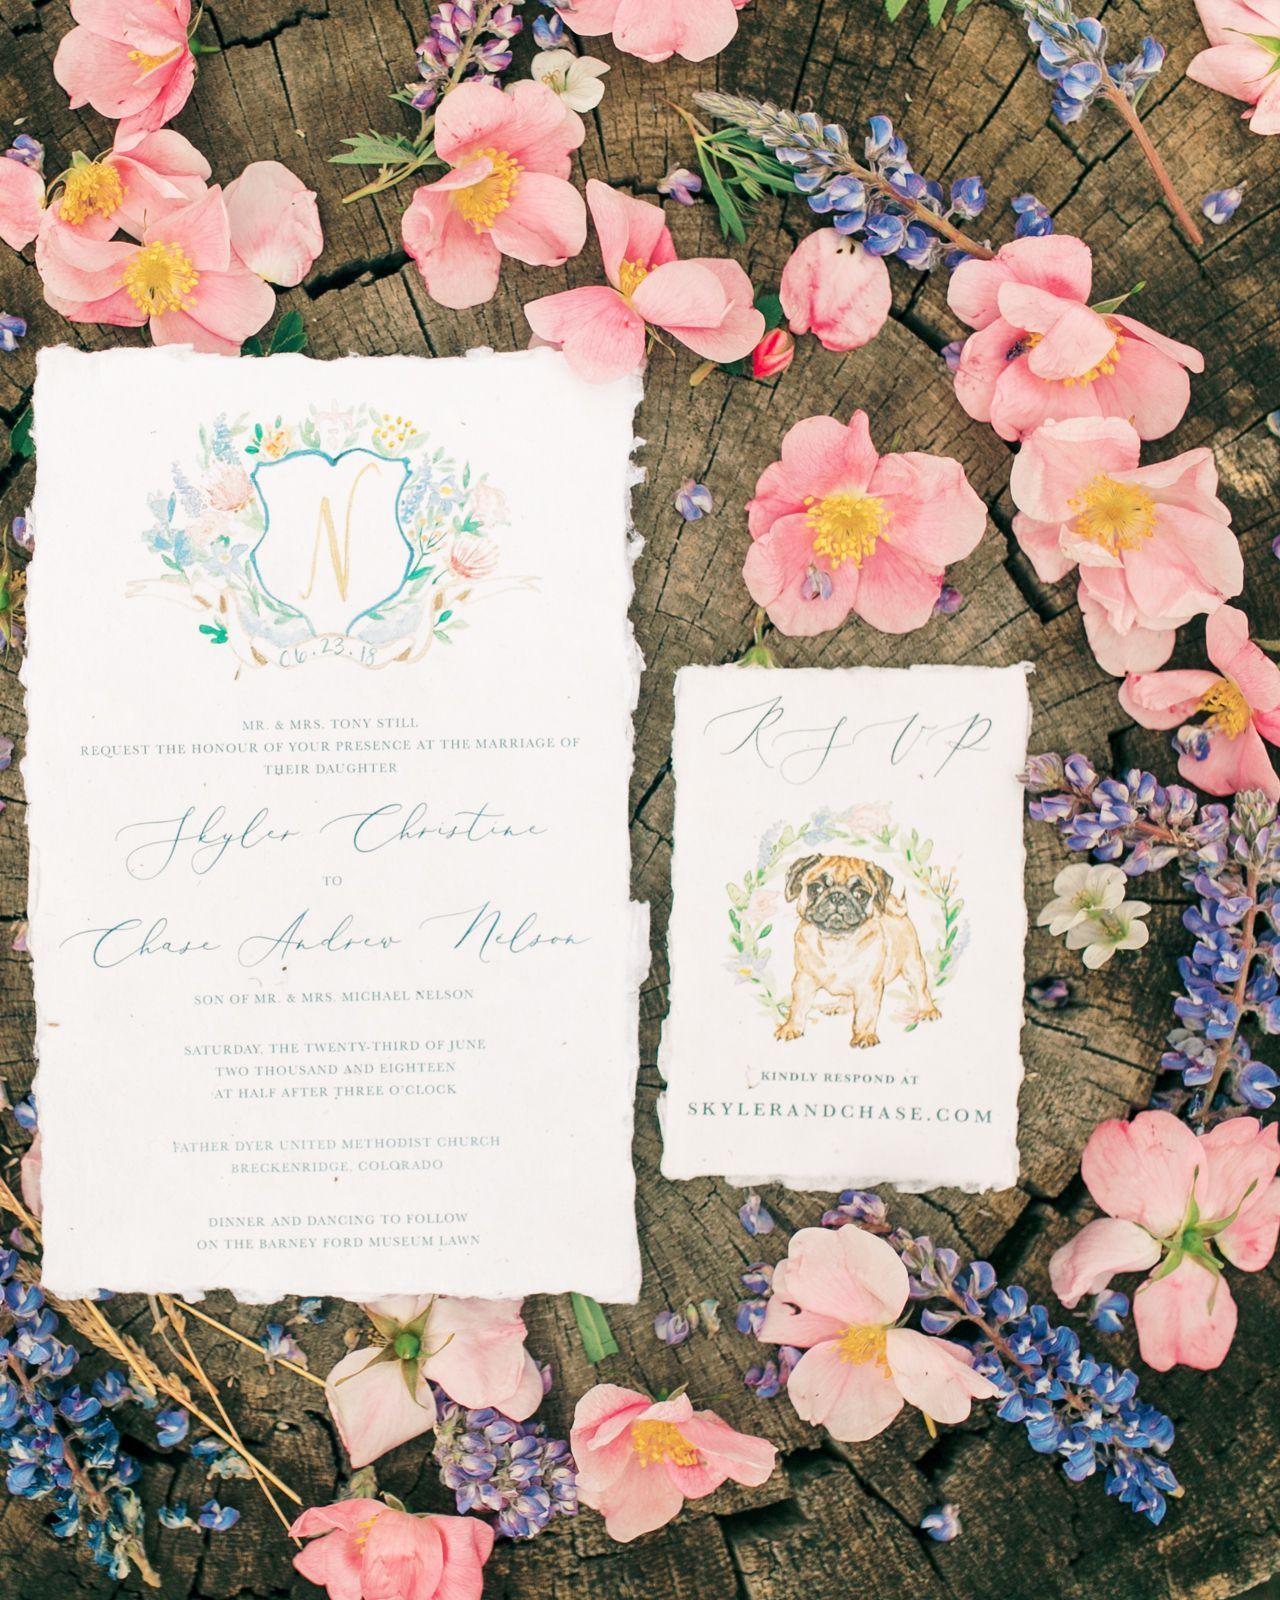 Vienna Glenn Photography, custom watercolor wedding invite